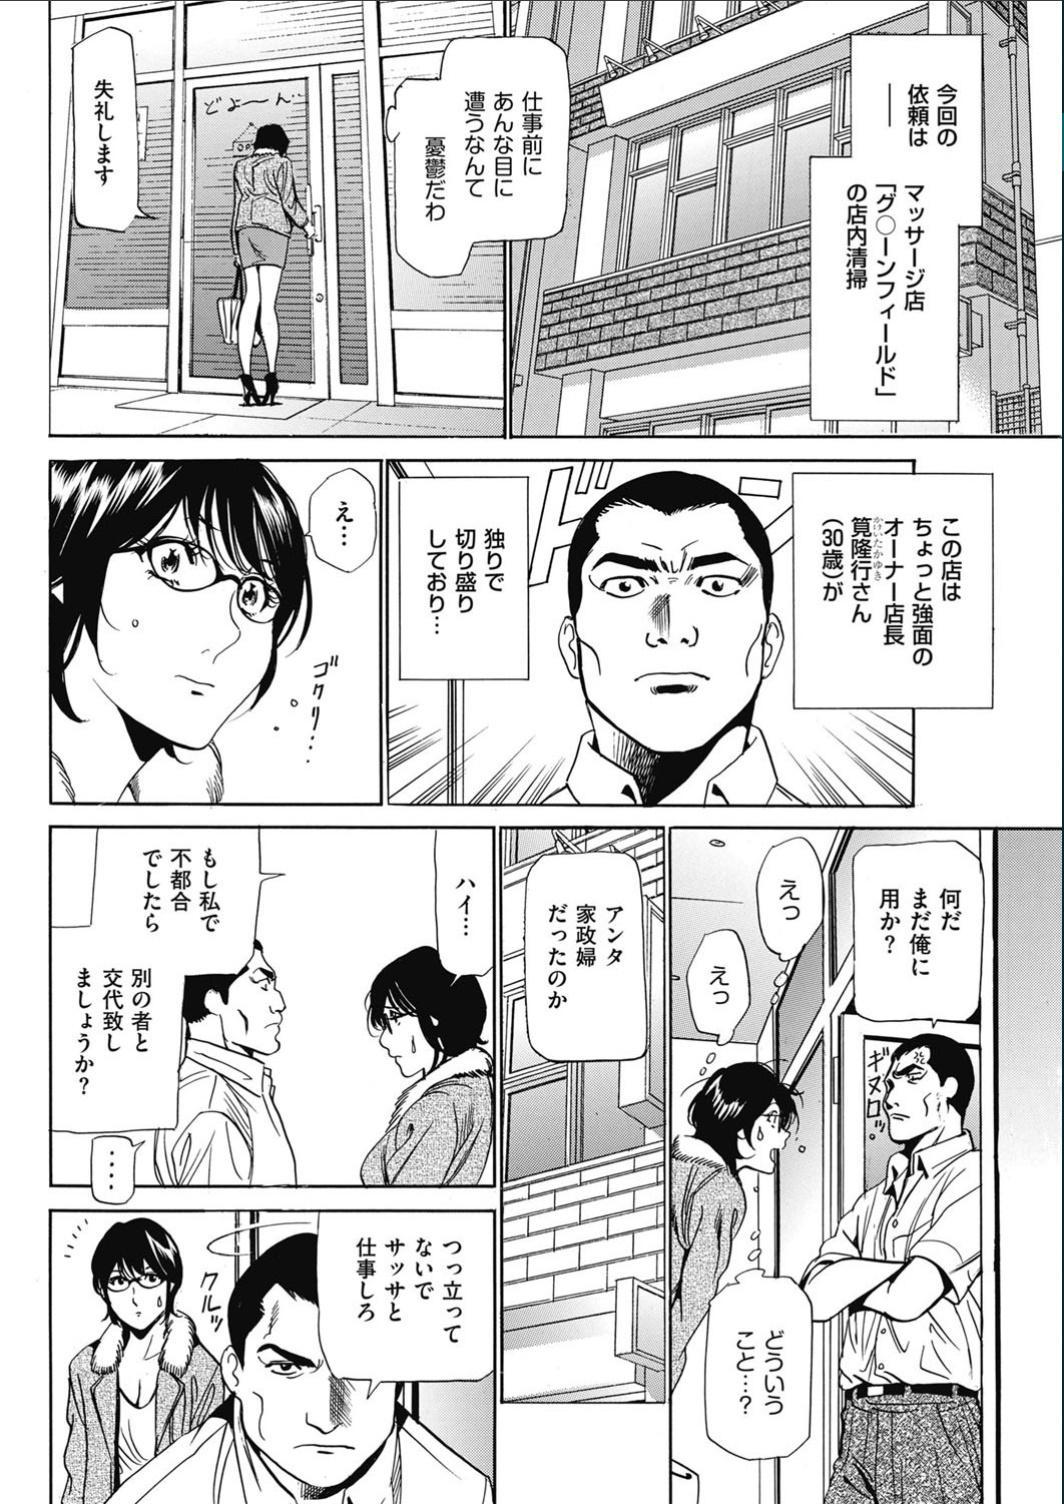 Wa Usuki Ipa a 1-10 96